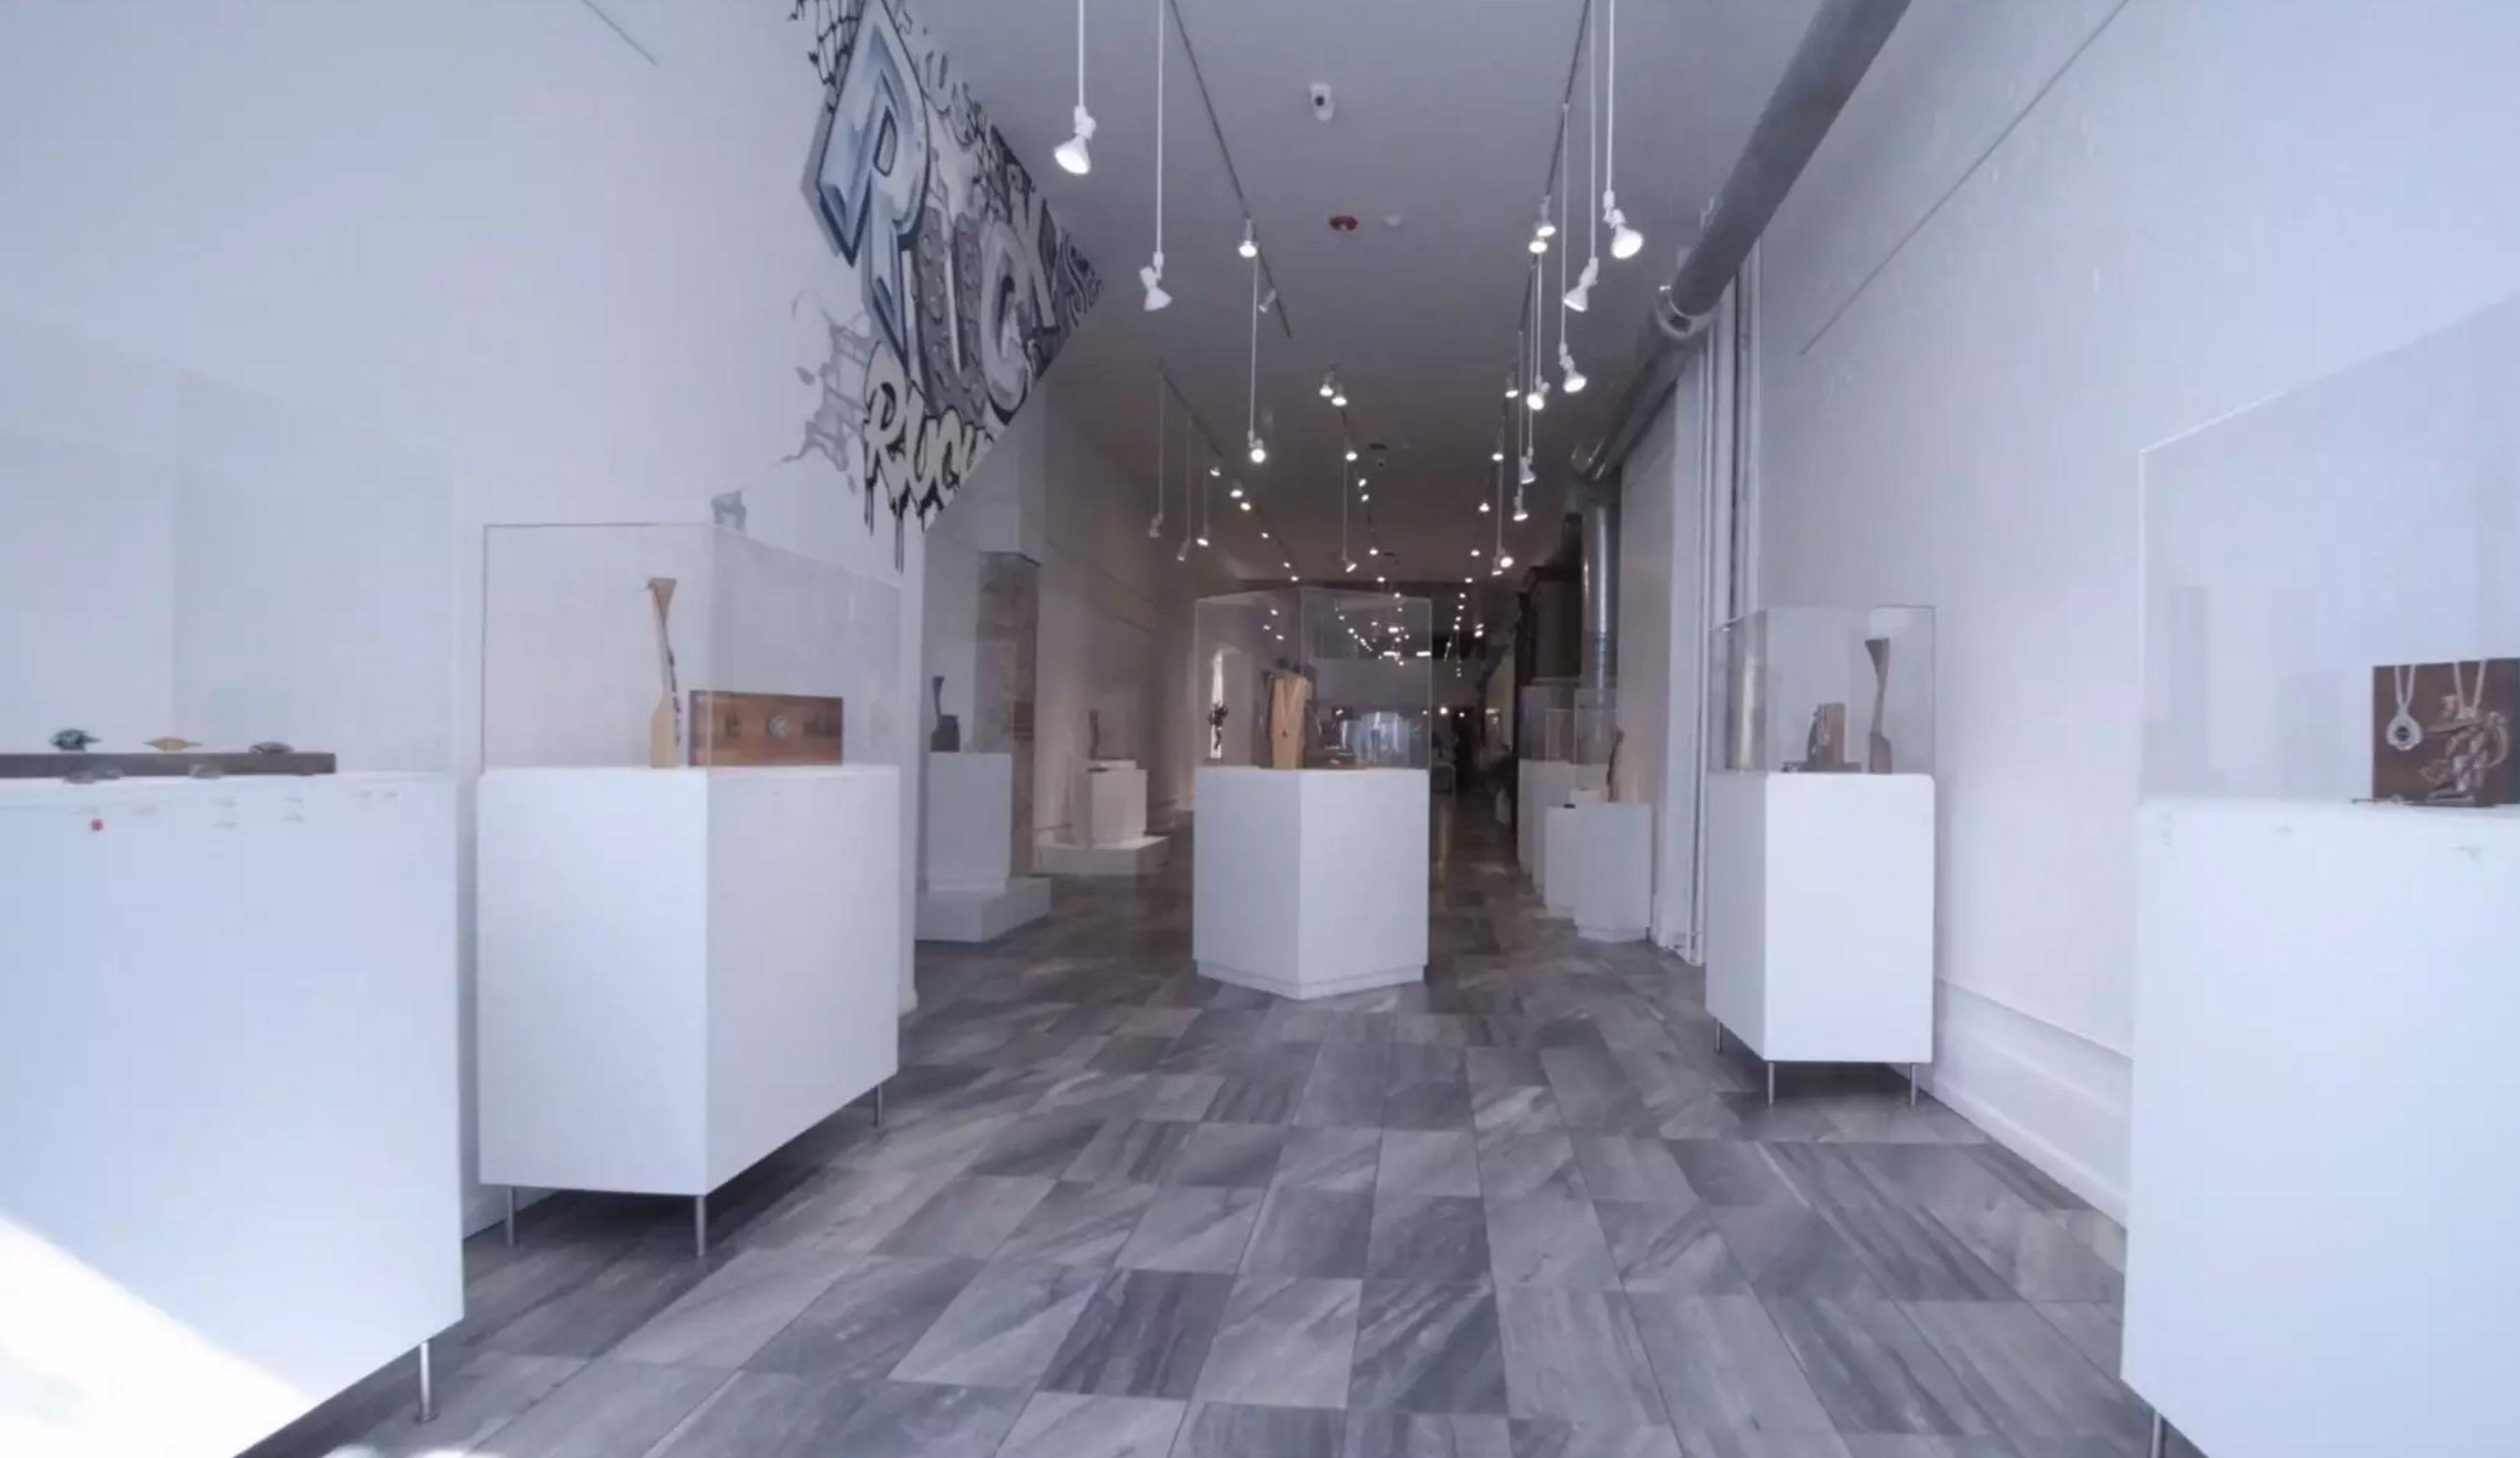 Ruckus Gallery